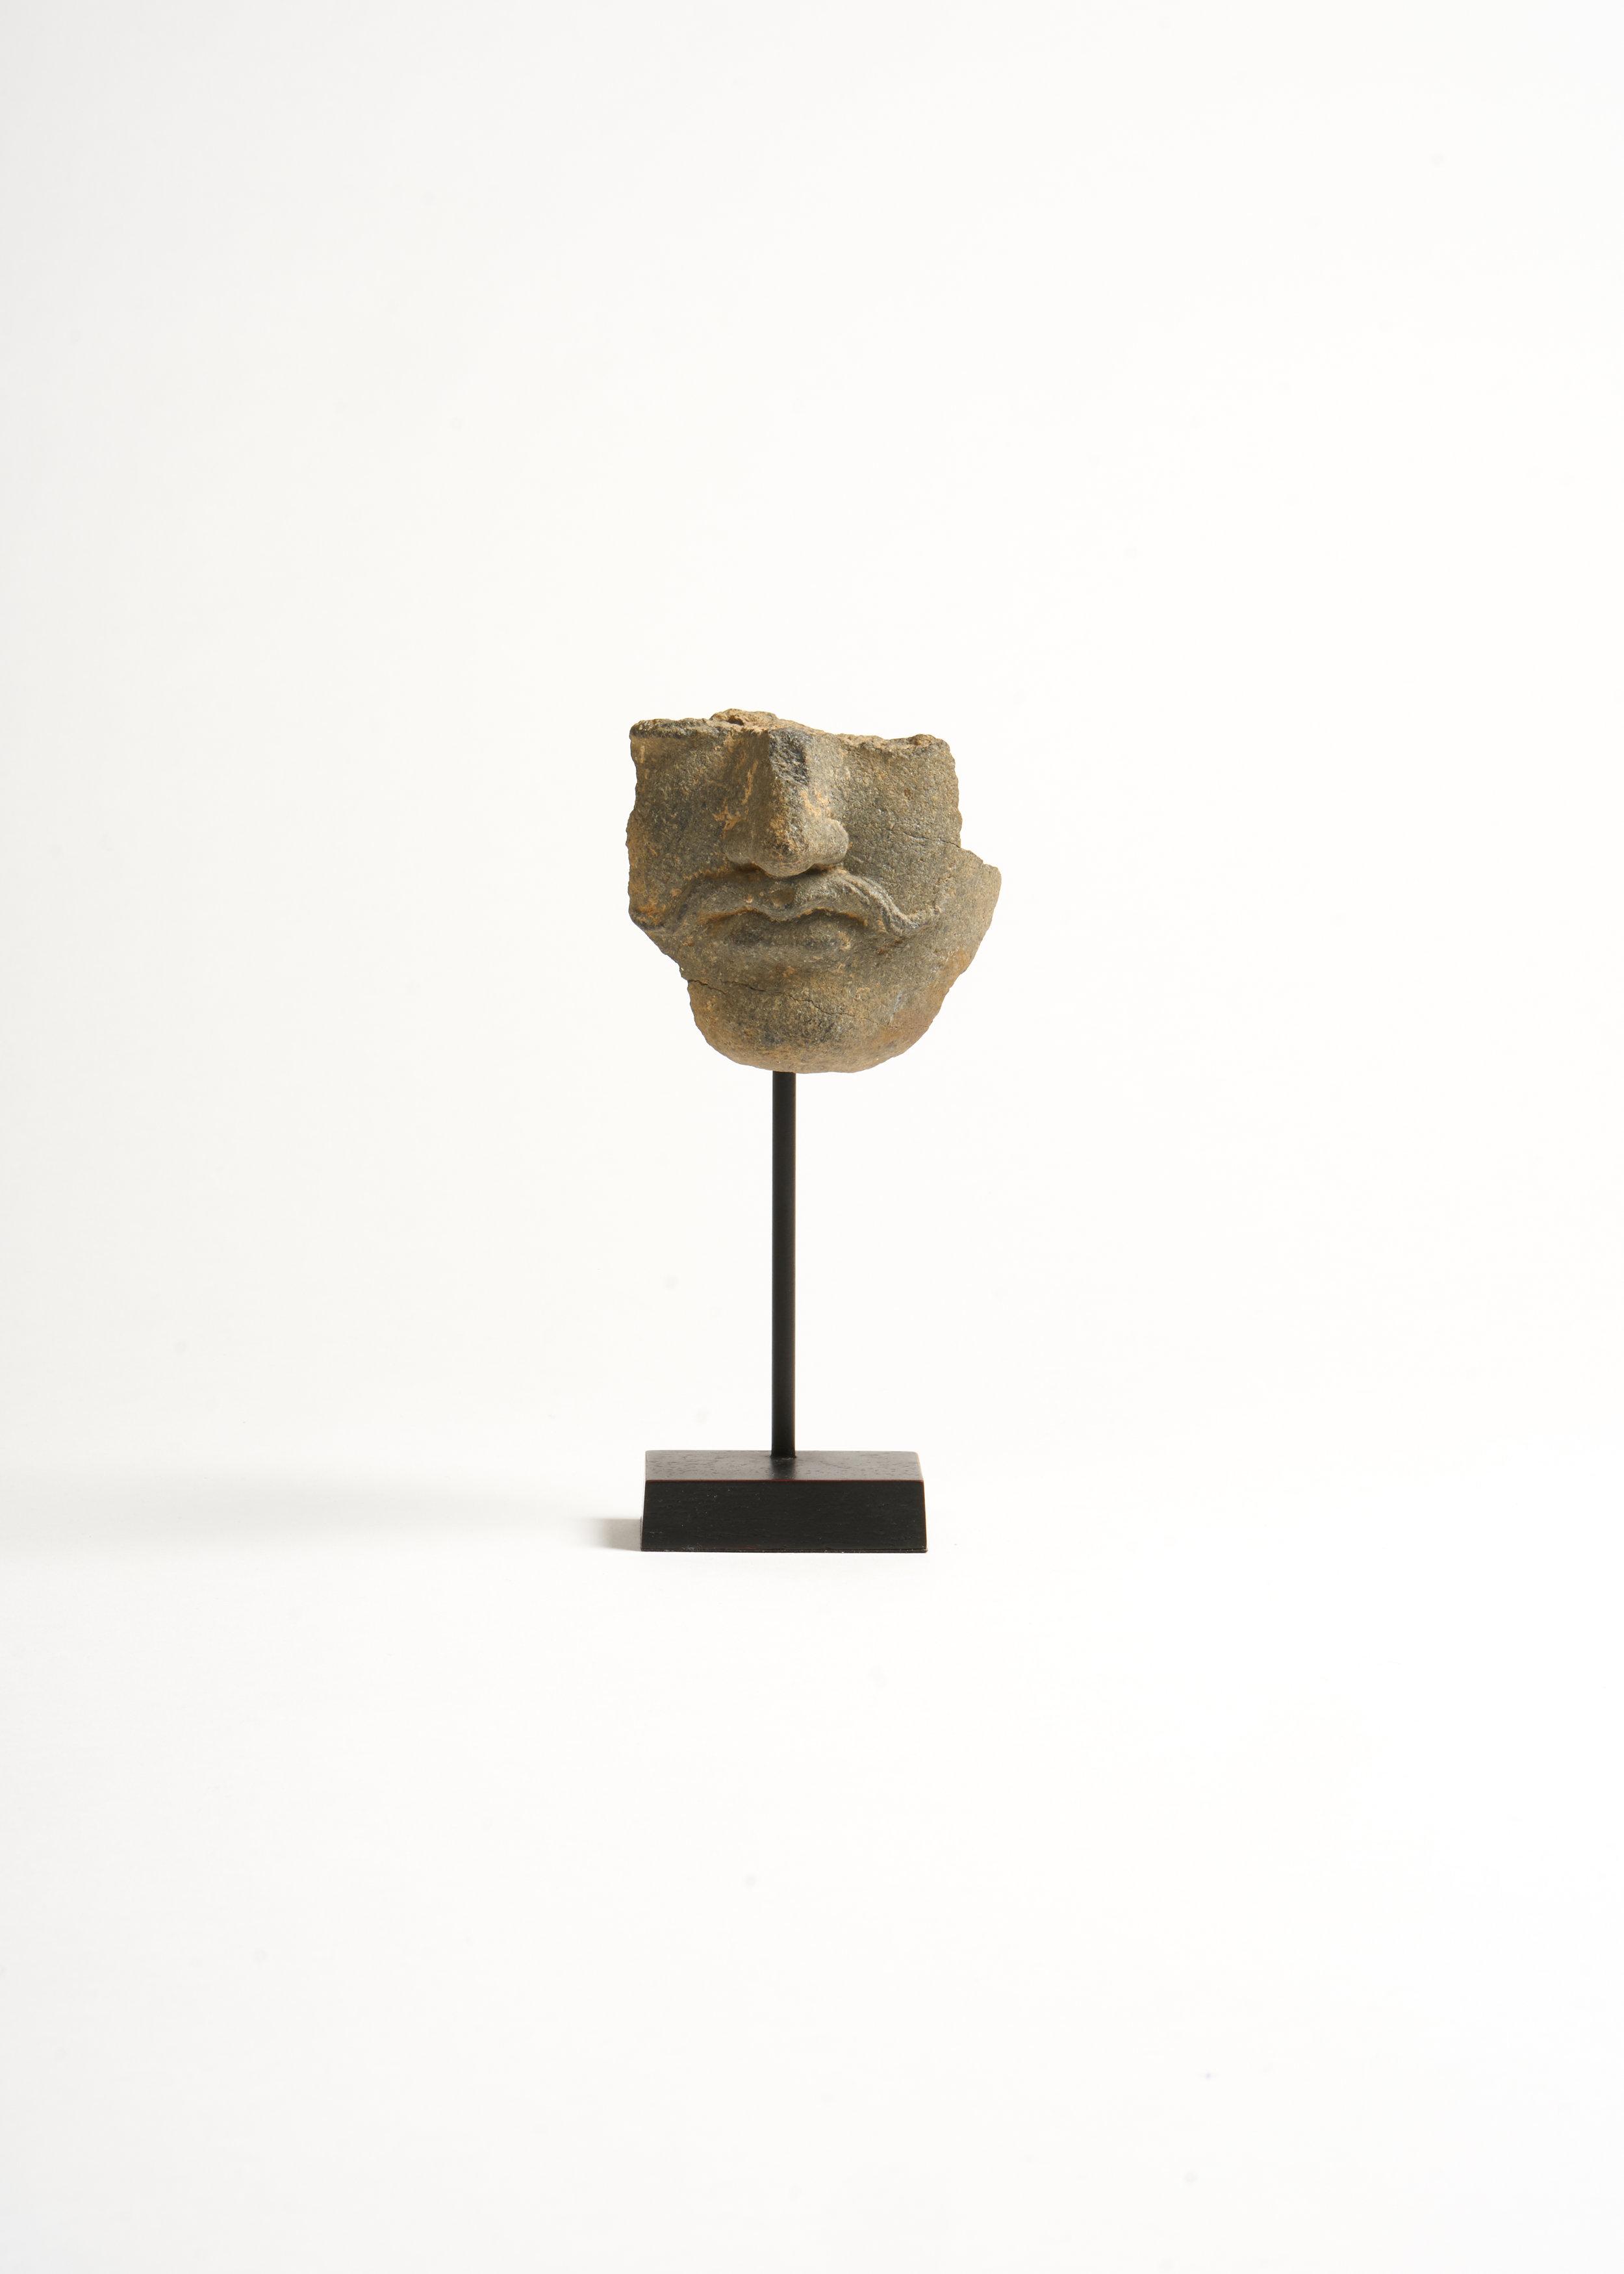 Gandhara Head Fragment